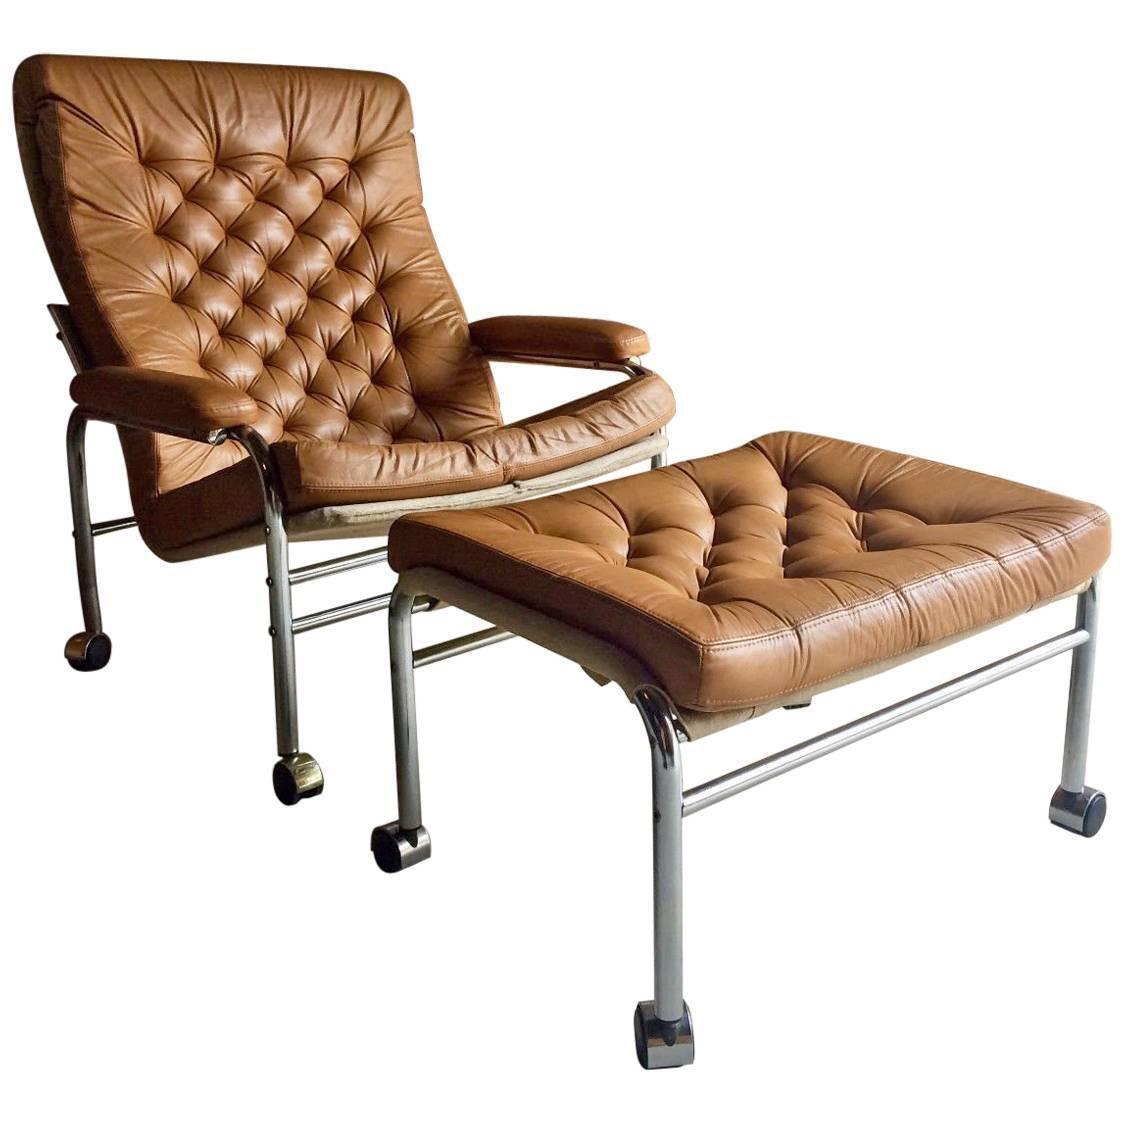 bore leder sessel fu hocker von noboru nakamura f r ikea. Black Bedroom Furniture Sets. Home Design Ideas